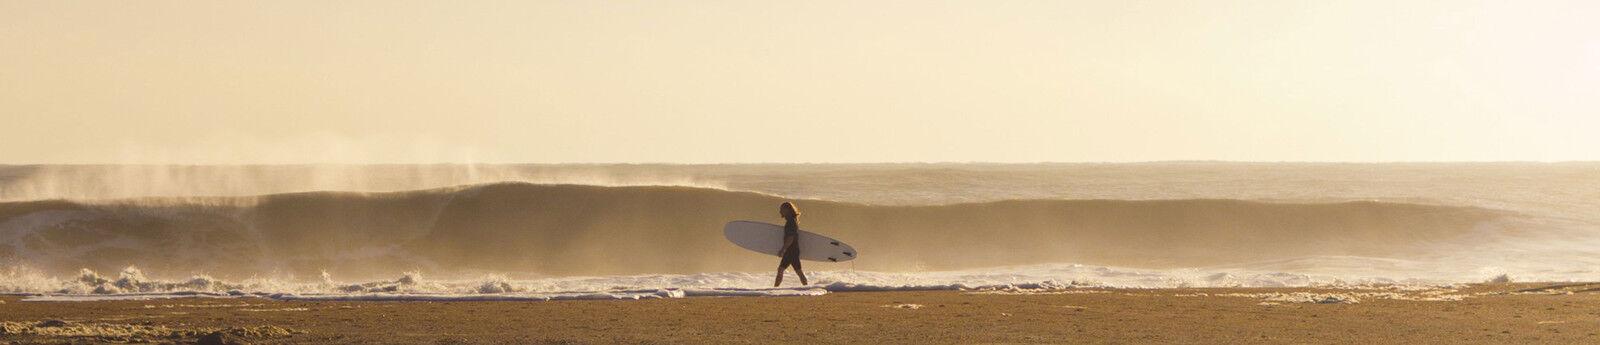 surfwearhere